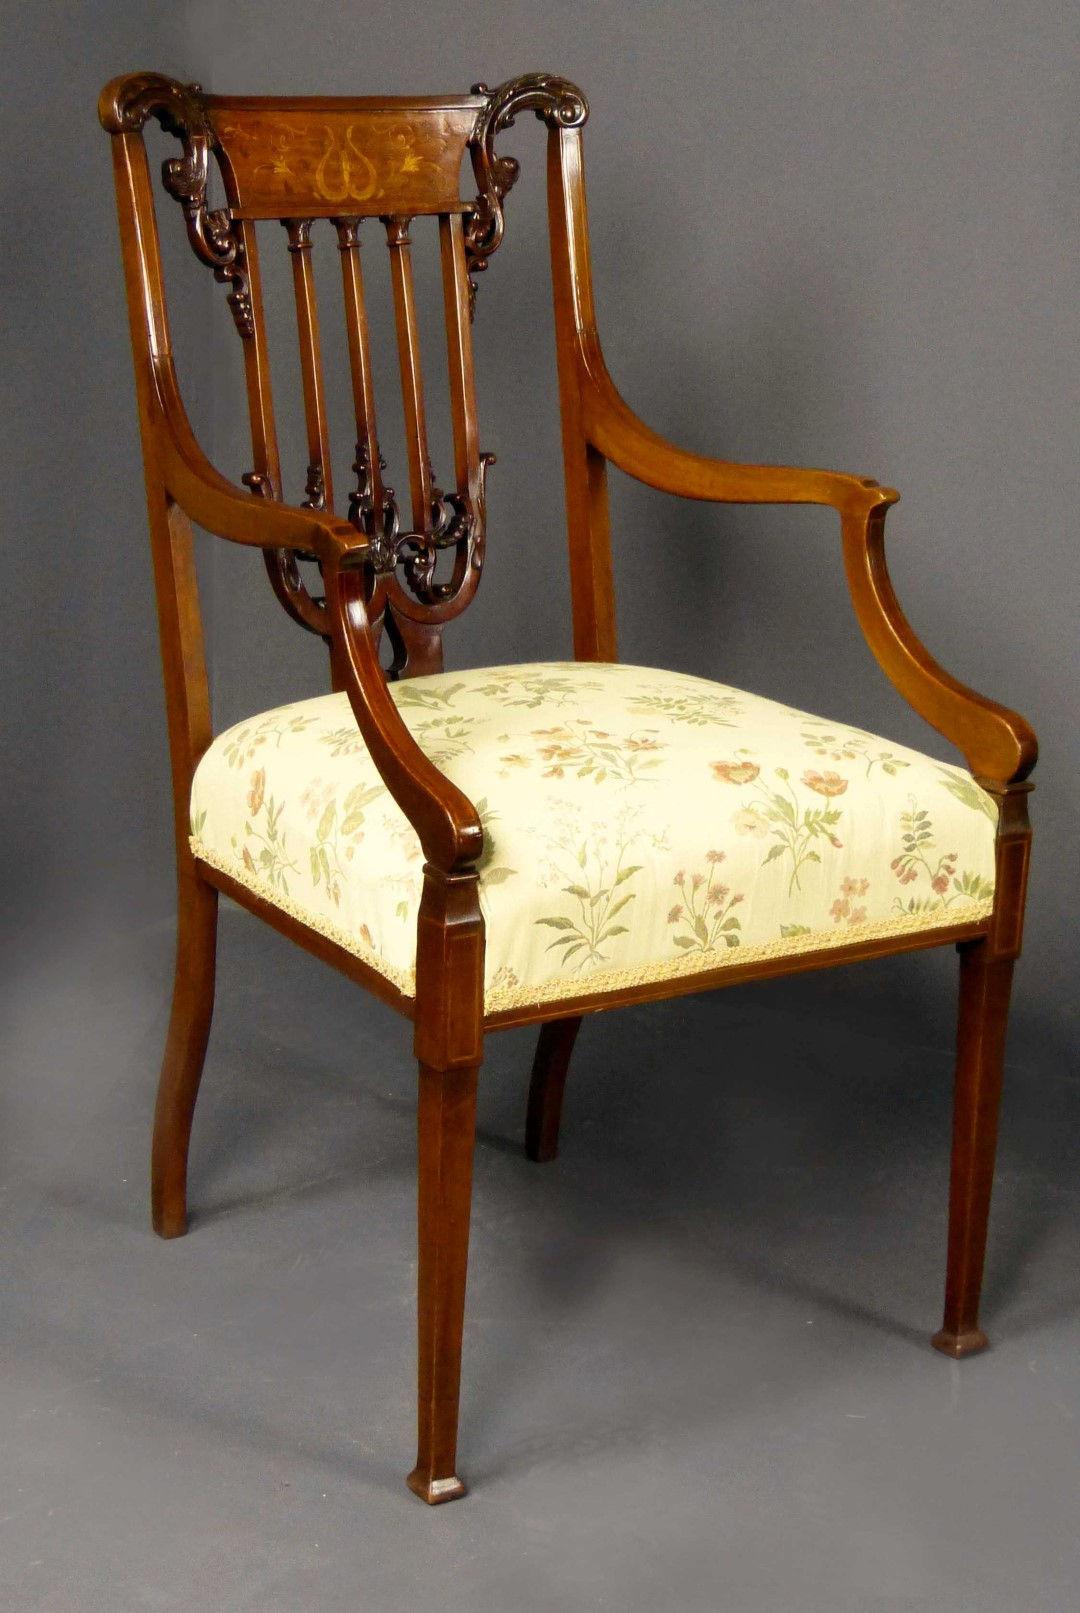 Muebles antiguos armarios antiguos mesas antiguas for Sofas espanoles calidad